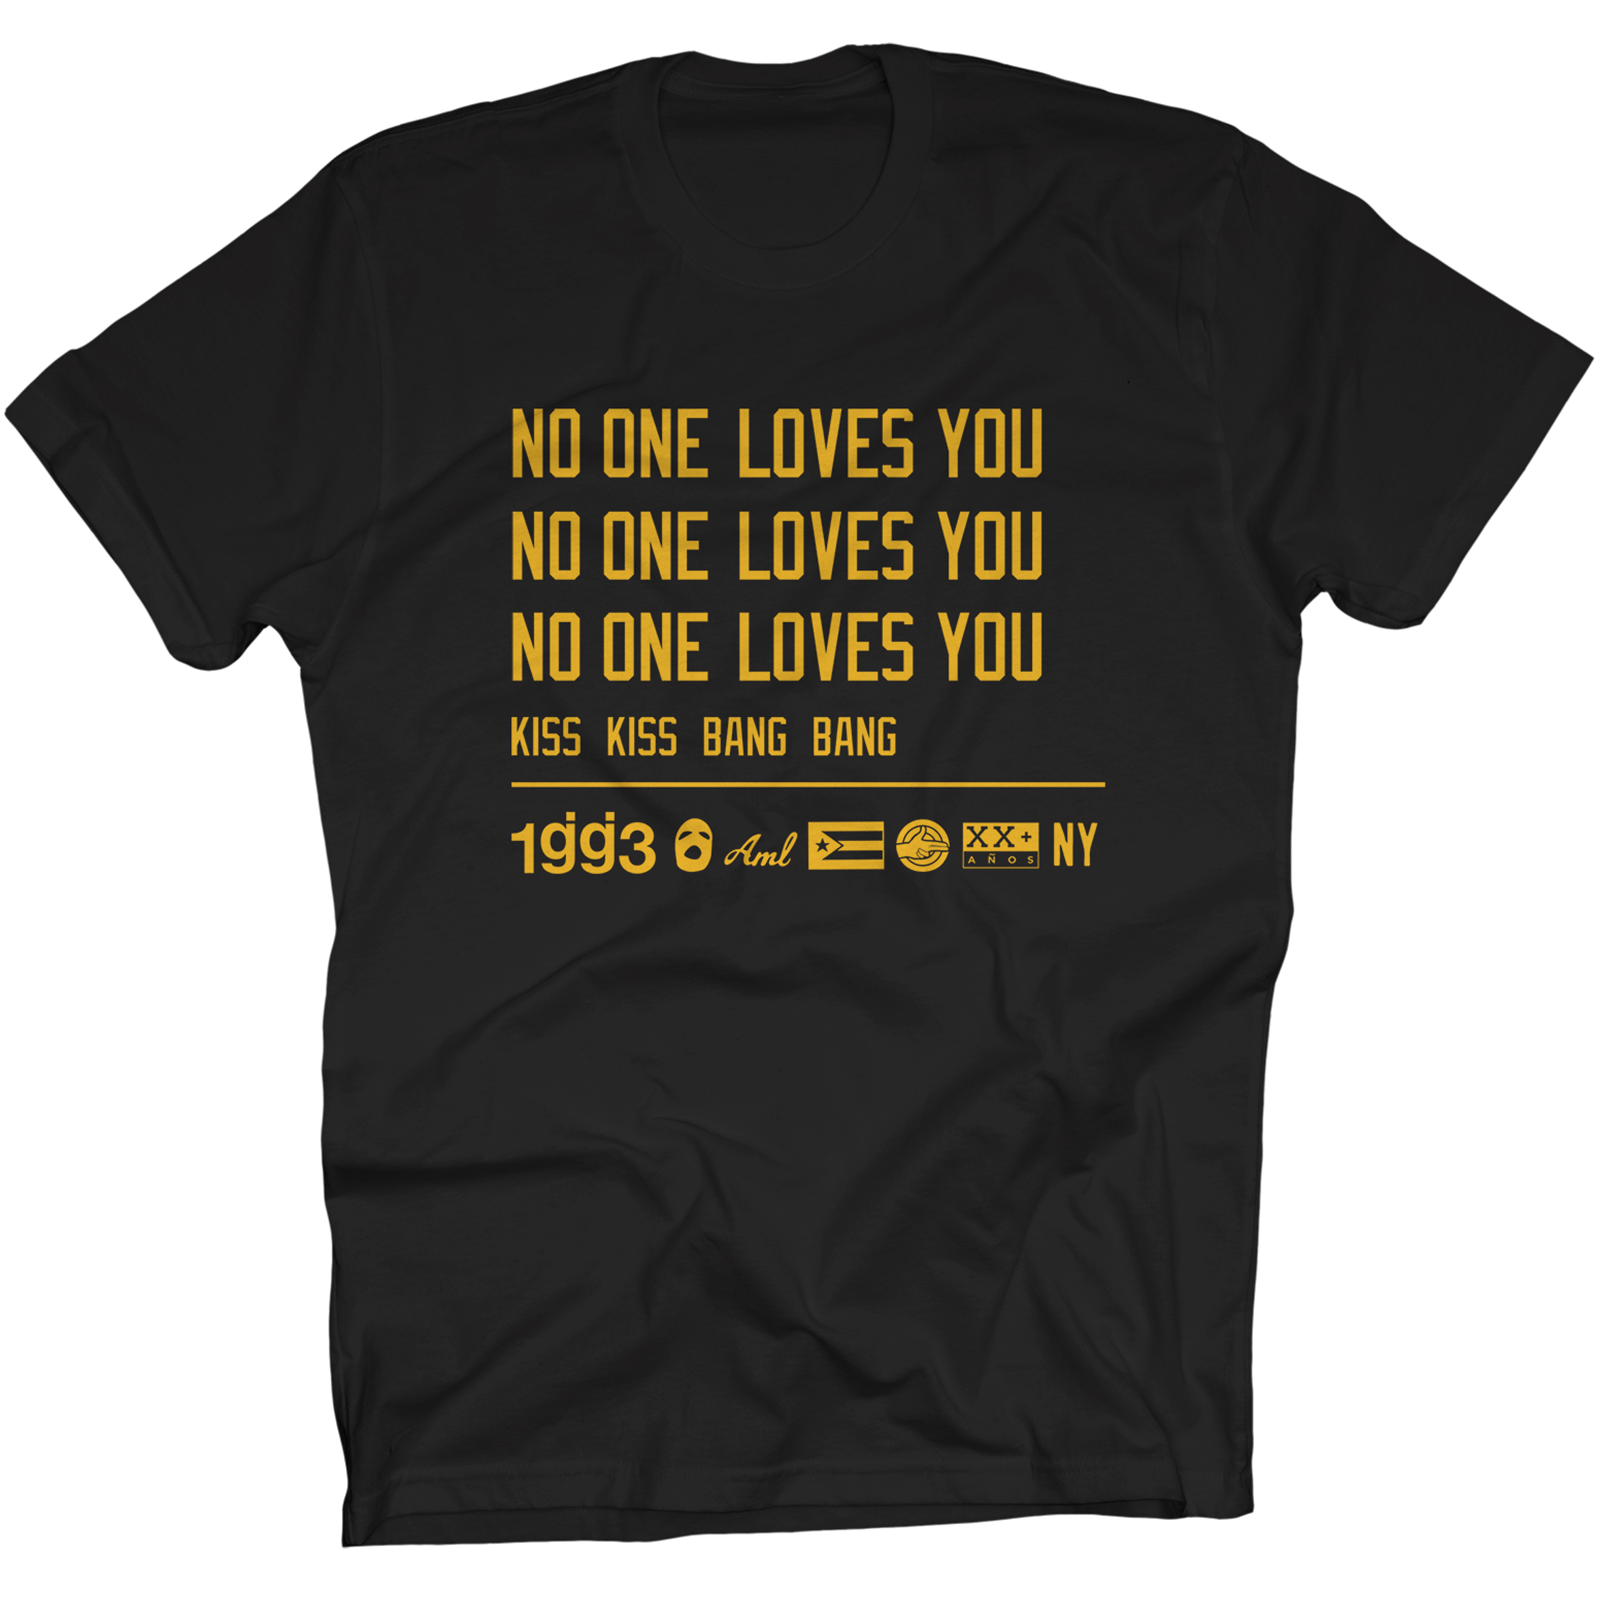 KKBB No One Loves You Black T-Shirt